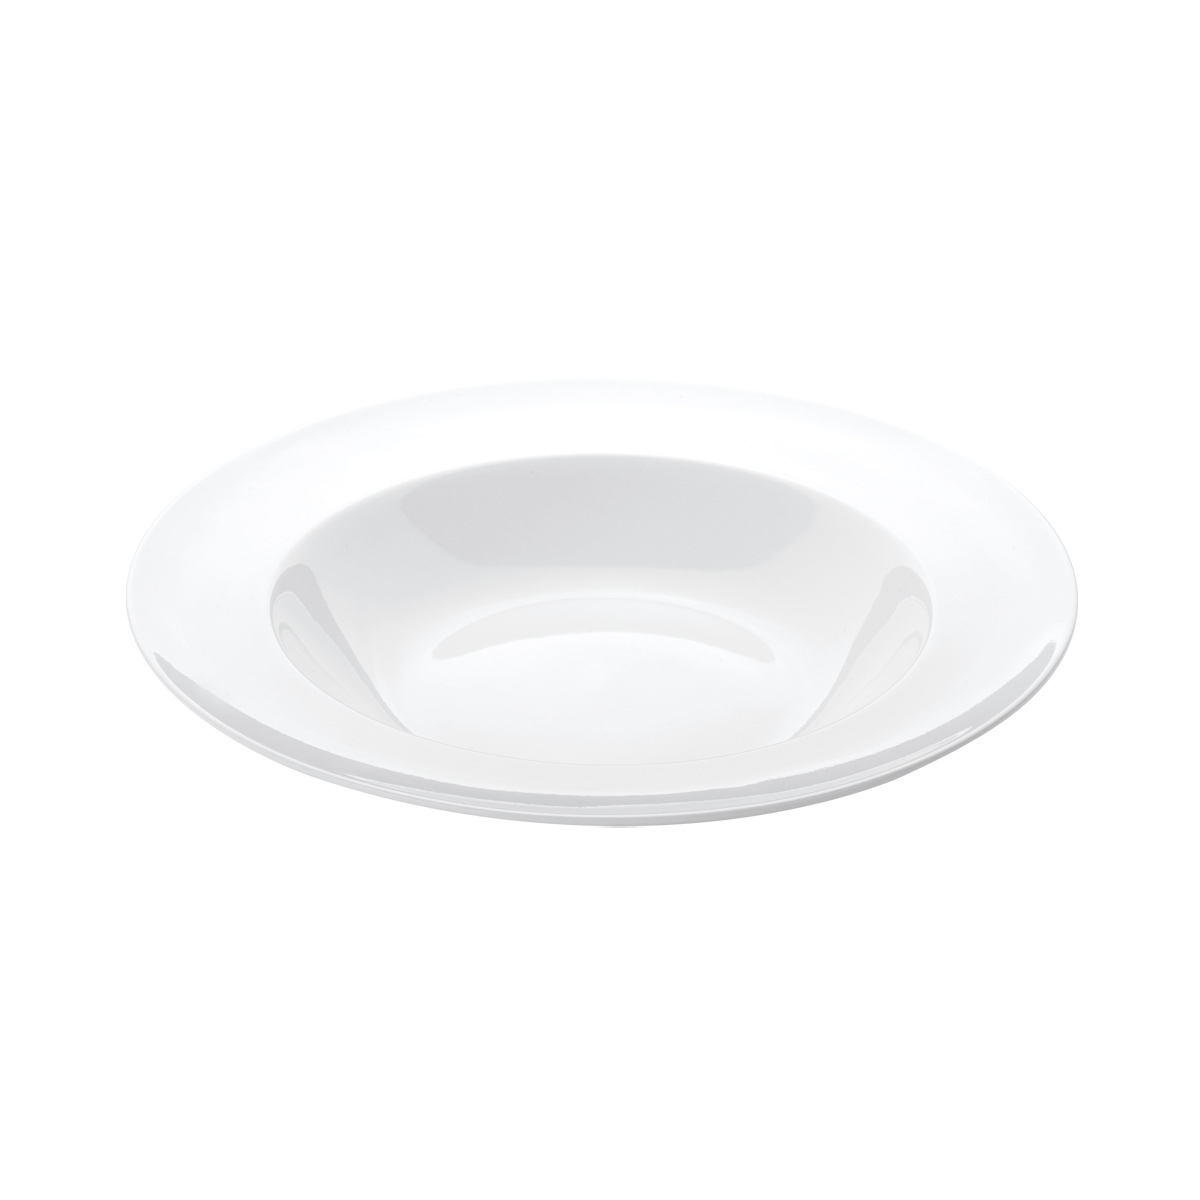 Hluboký talíř OPUS ø 22 cm